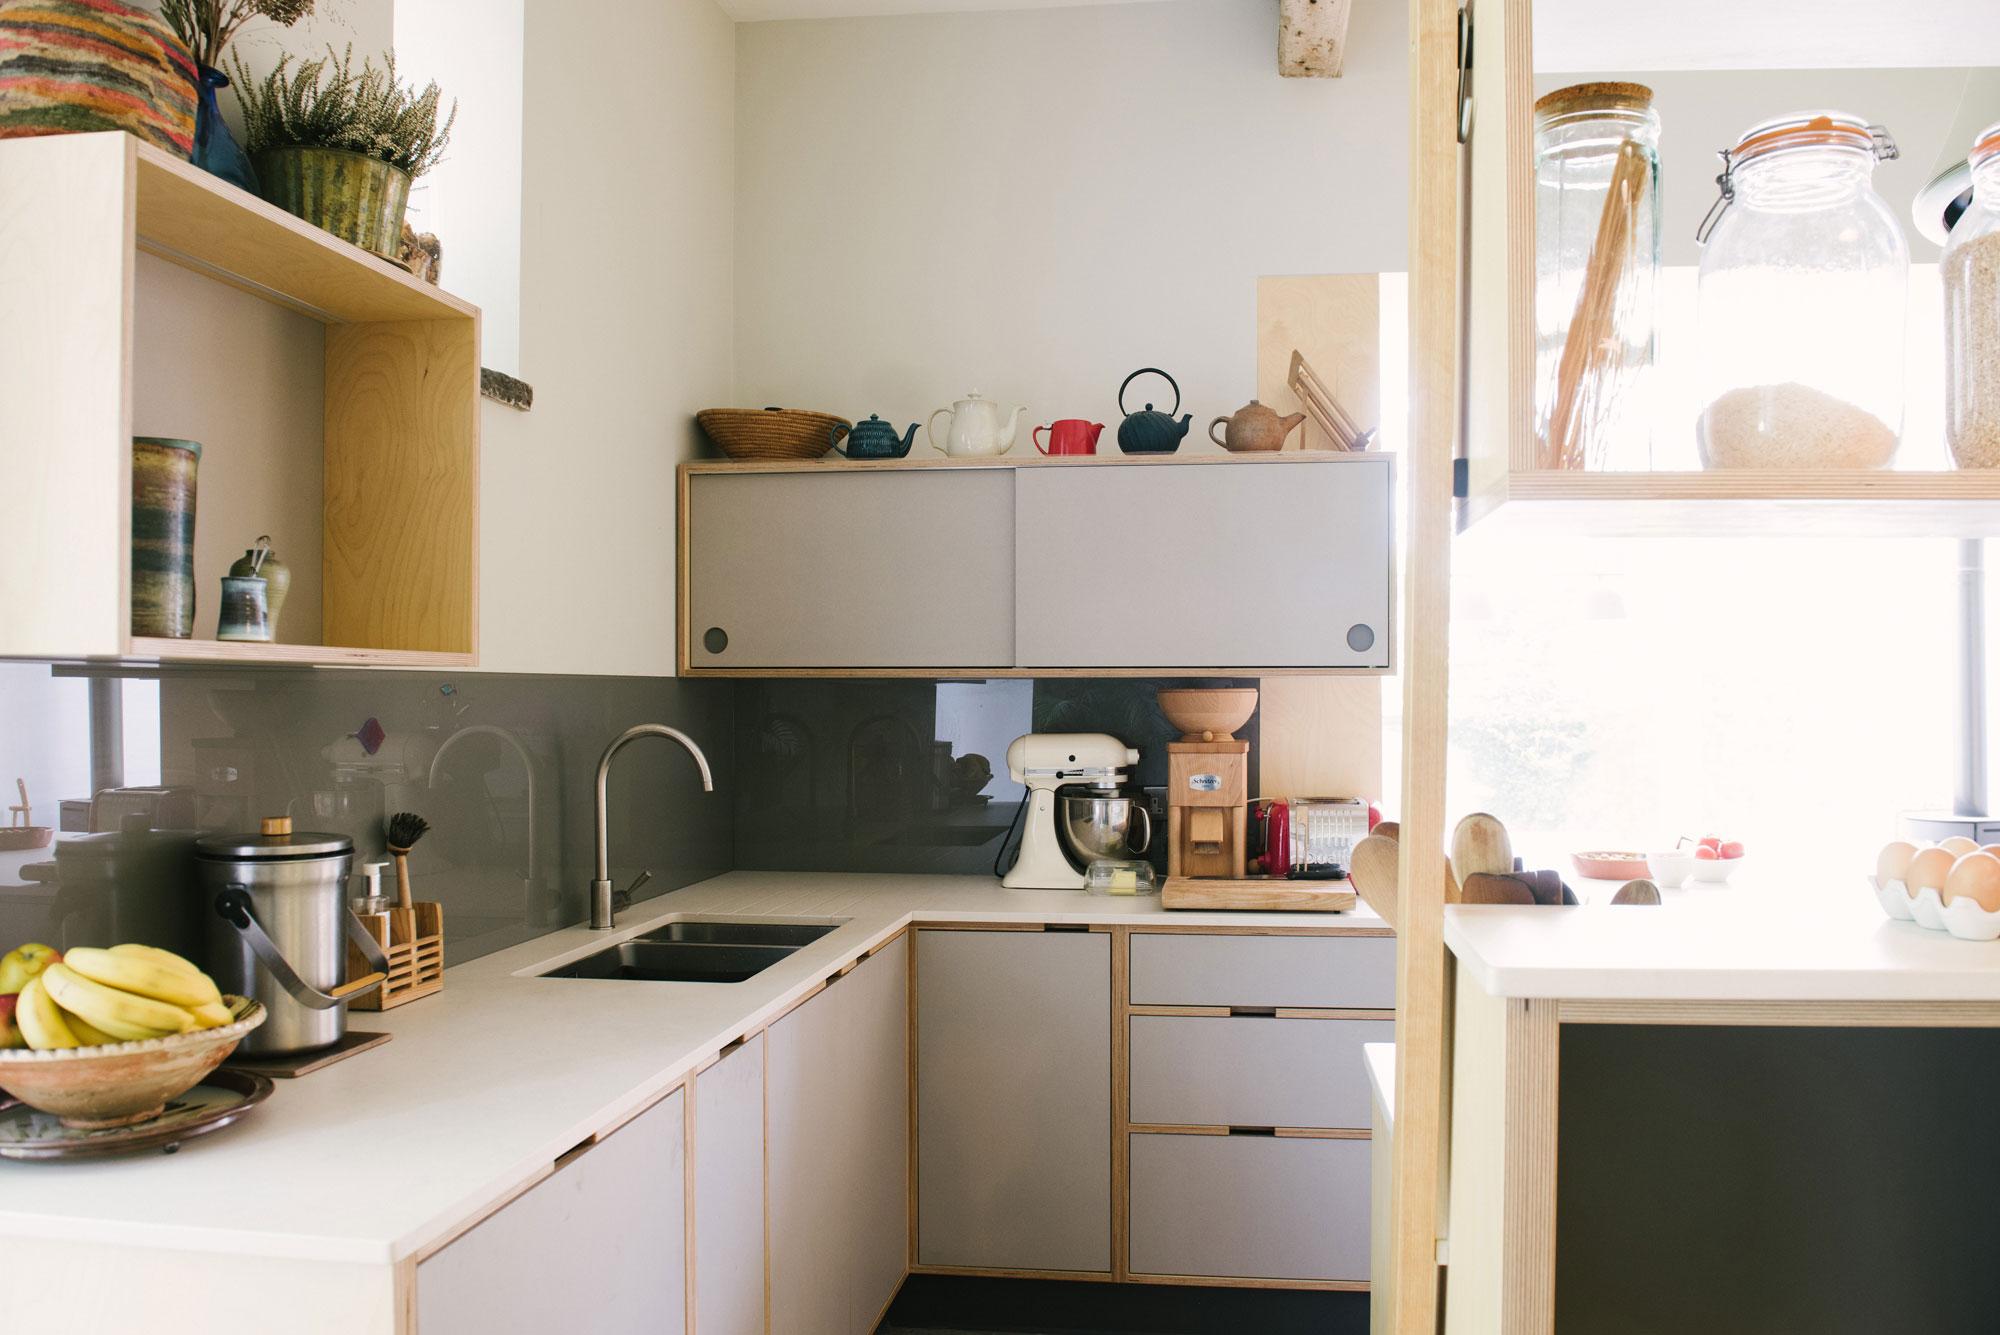 Living Room Dining Kitchen Designs